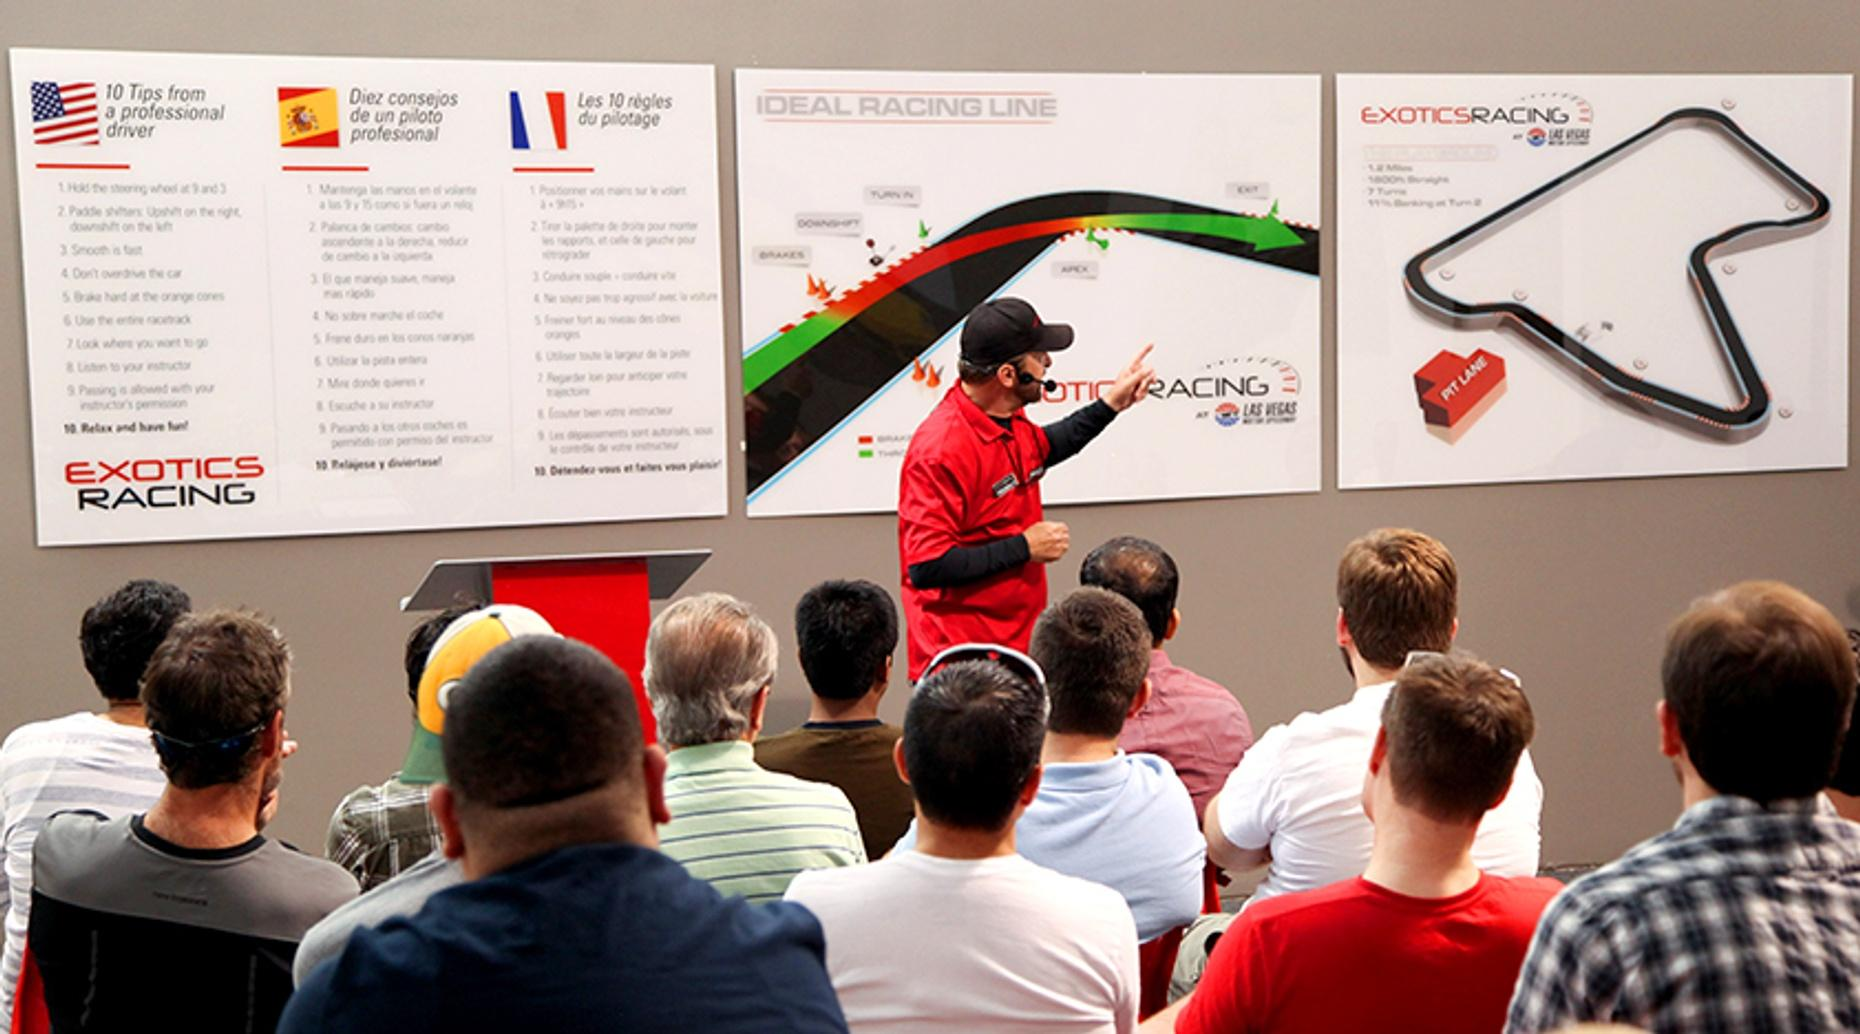 Las Vegas Race Car Driver Experience with a Porsche